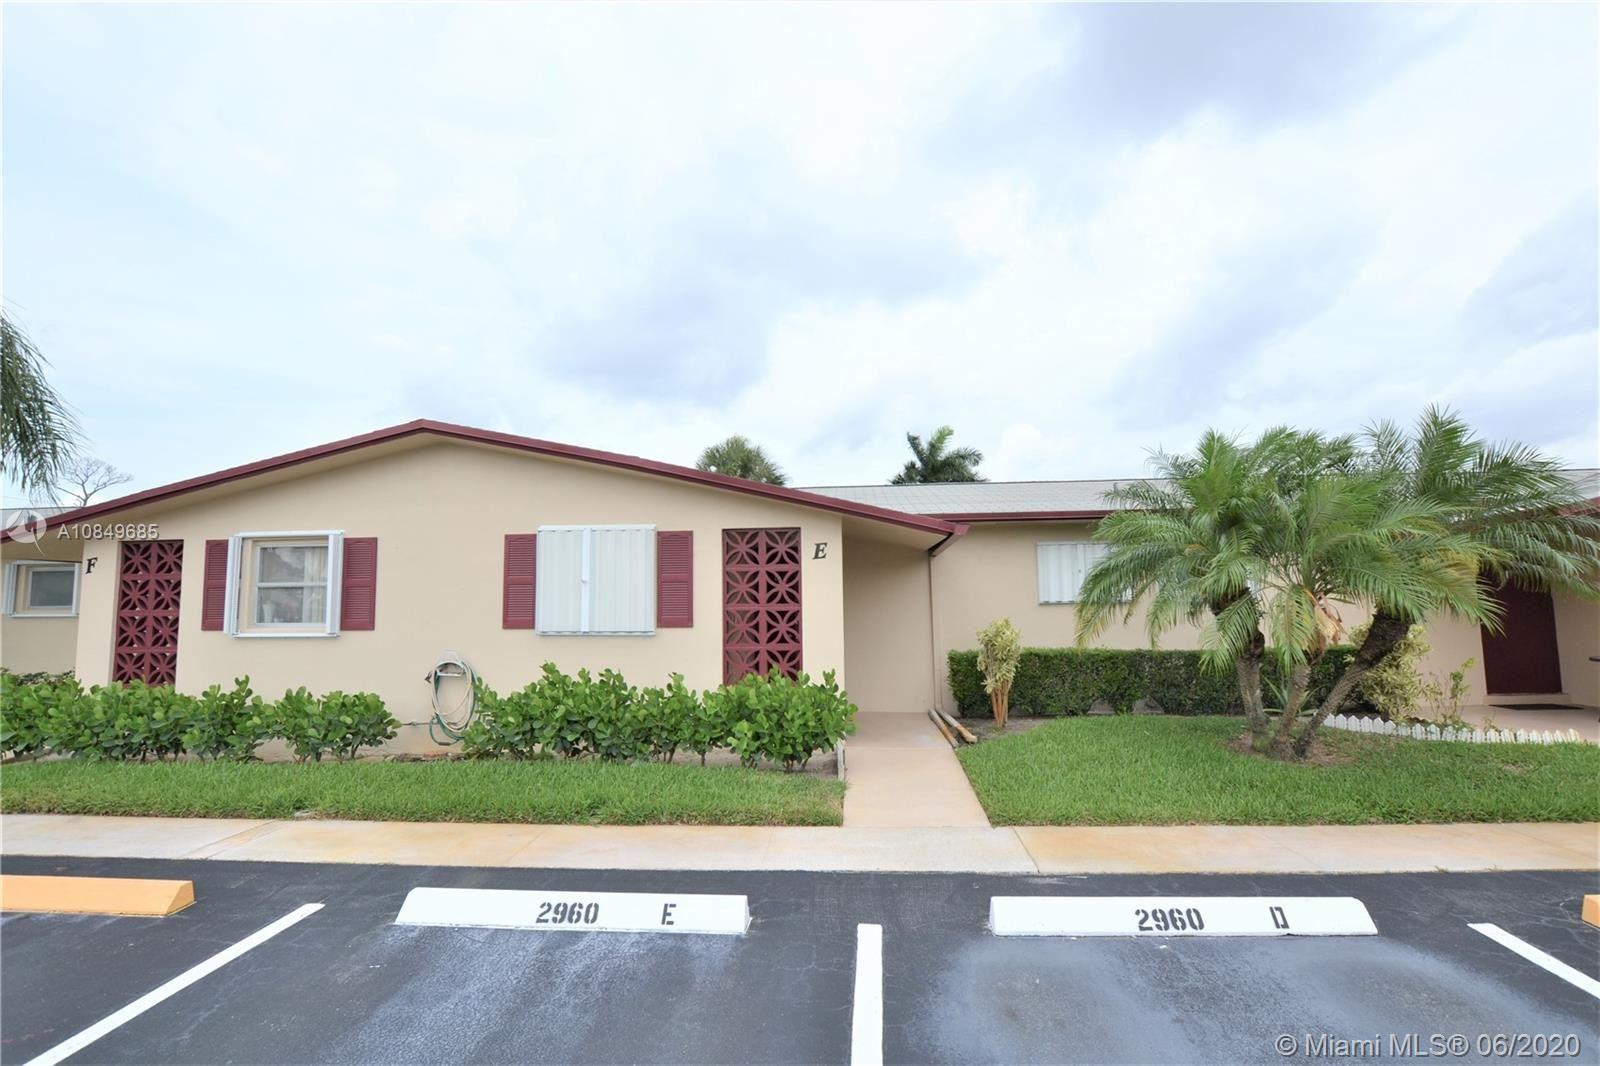 2960 Crosley Dr E #E, West Palm Beach, FL 33415 - #: A10849685